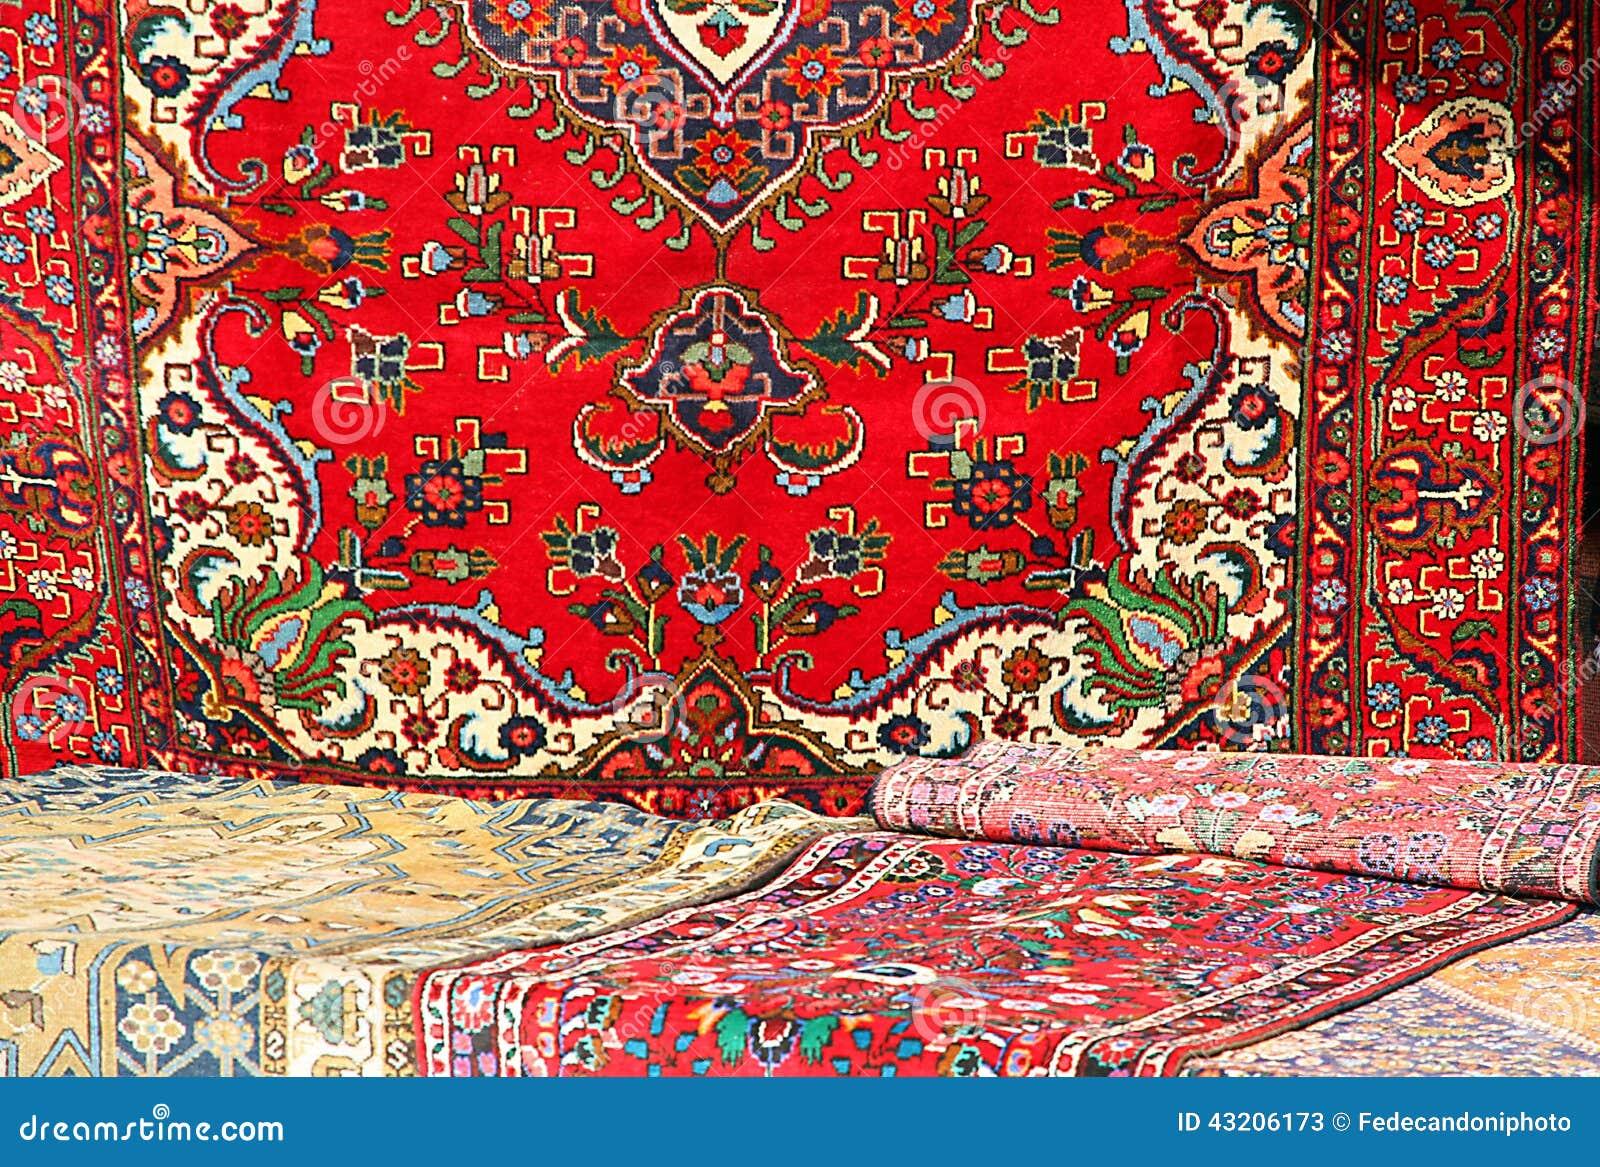 Colorful And Beautiful Oriental Rugs In Pure Virgin Wool 1